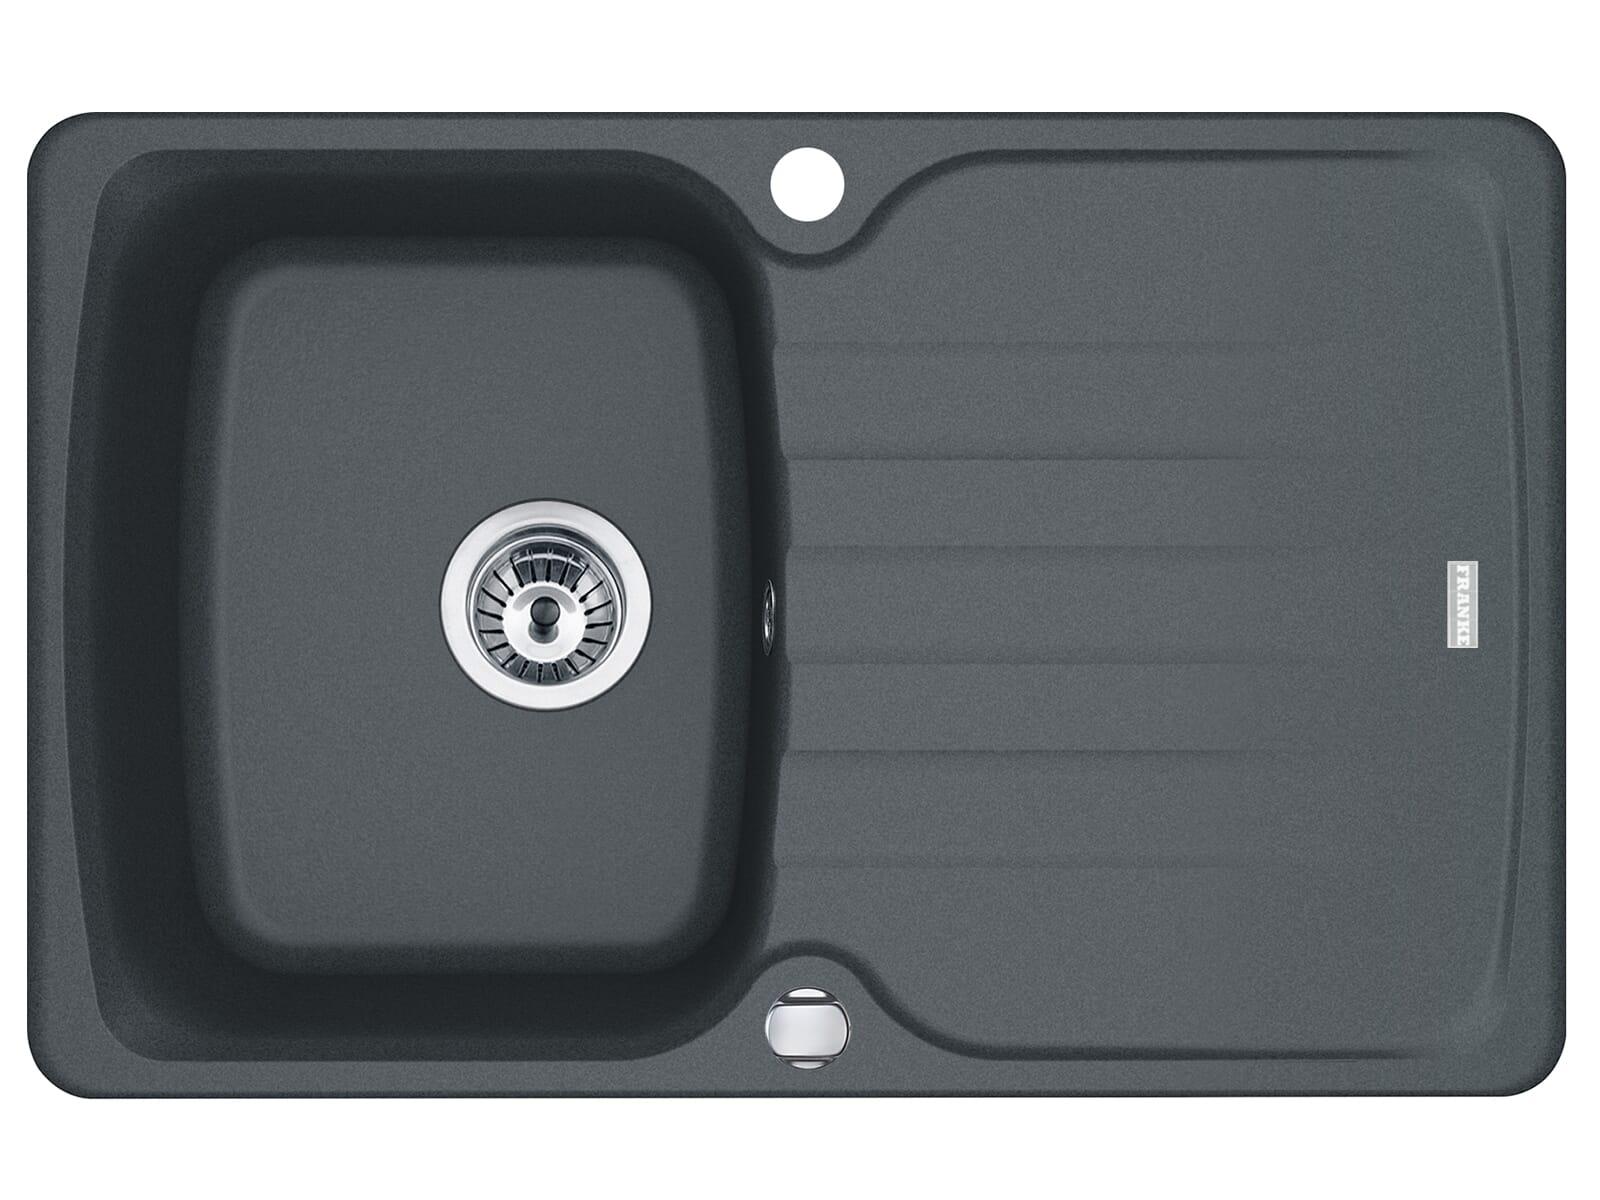 Franke Antea AZG 611-78 Graphit - 114.0512.139 Granitspüle Exzenterbetätigung